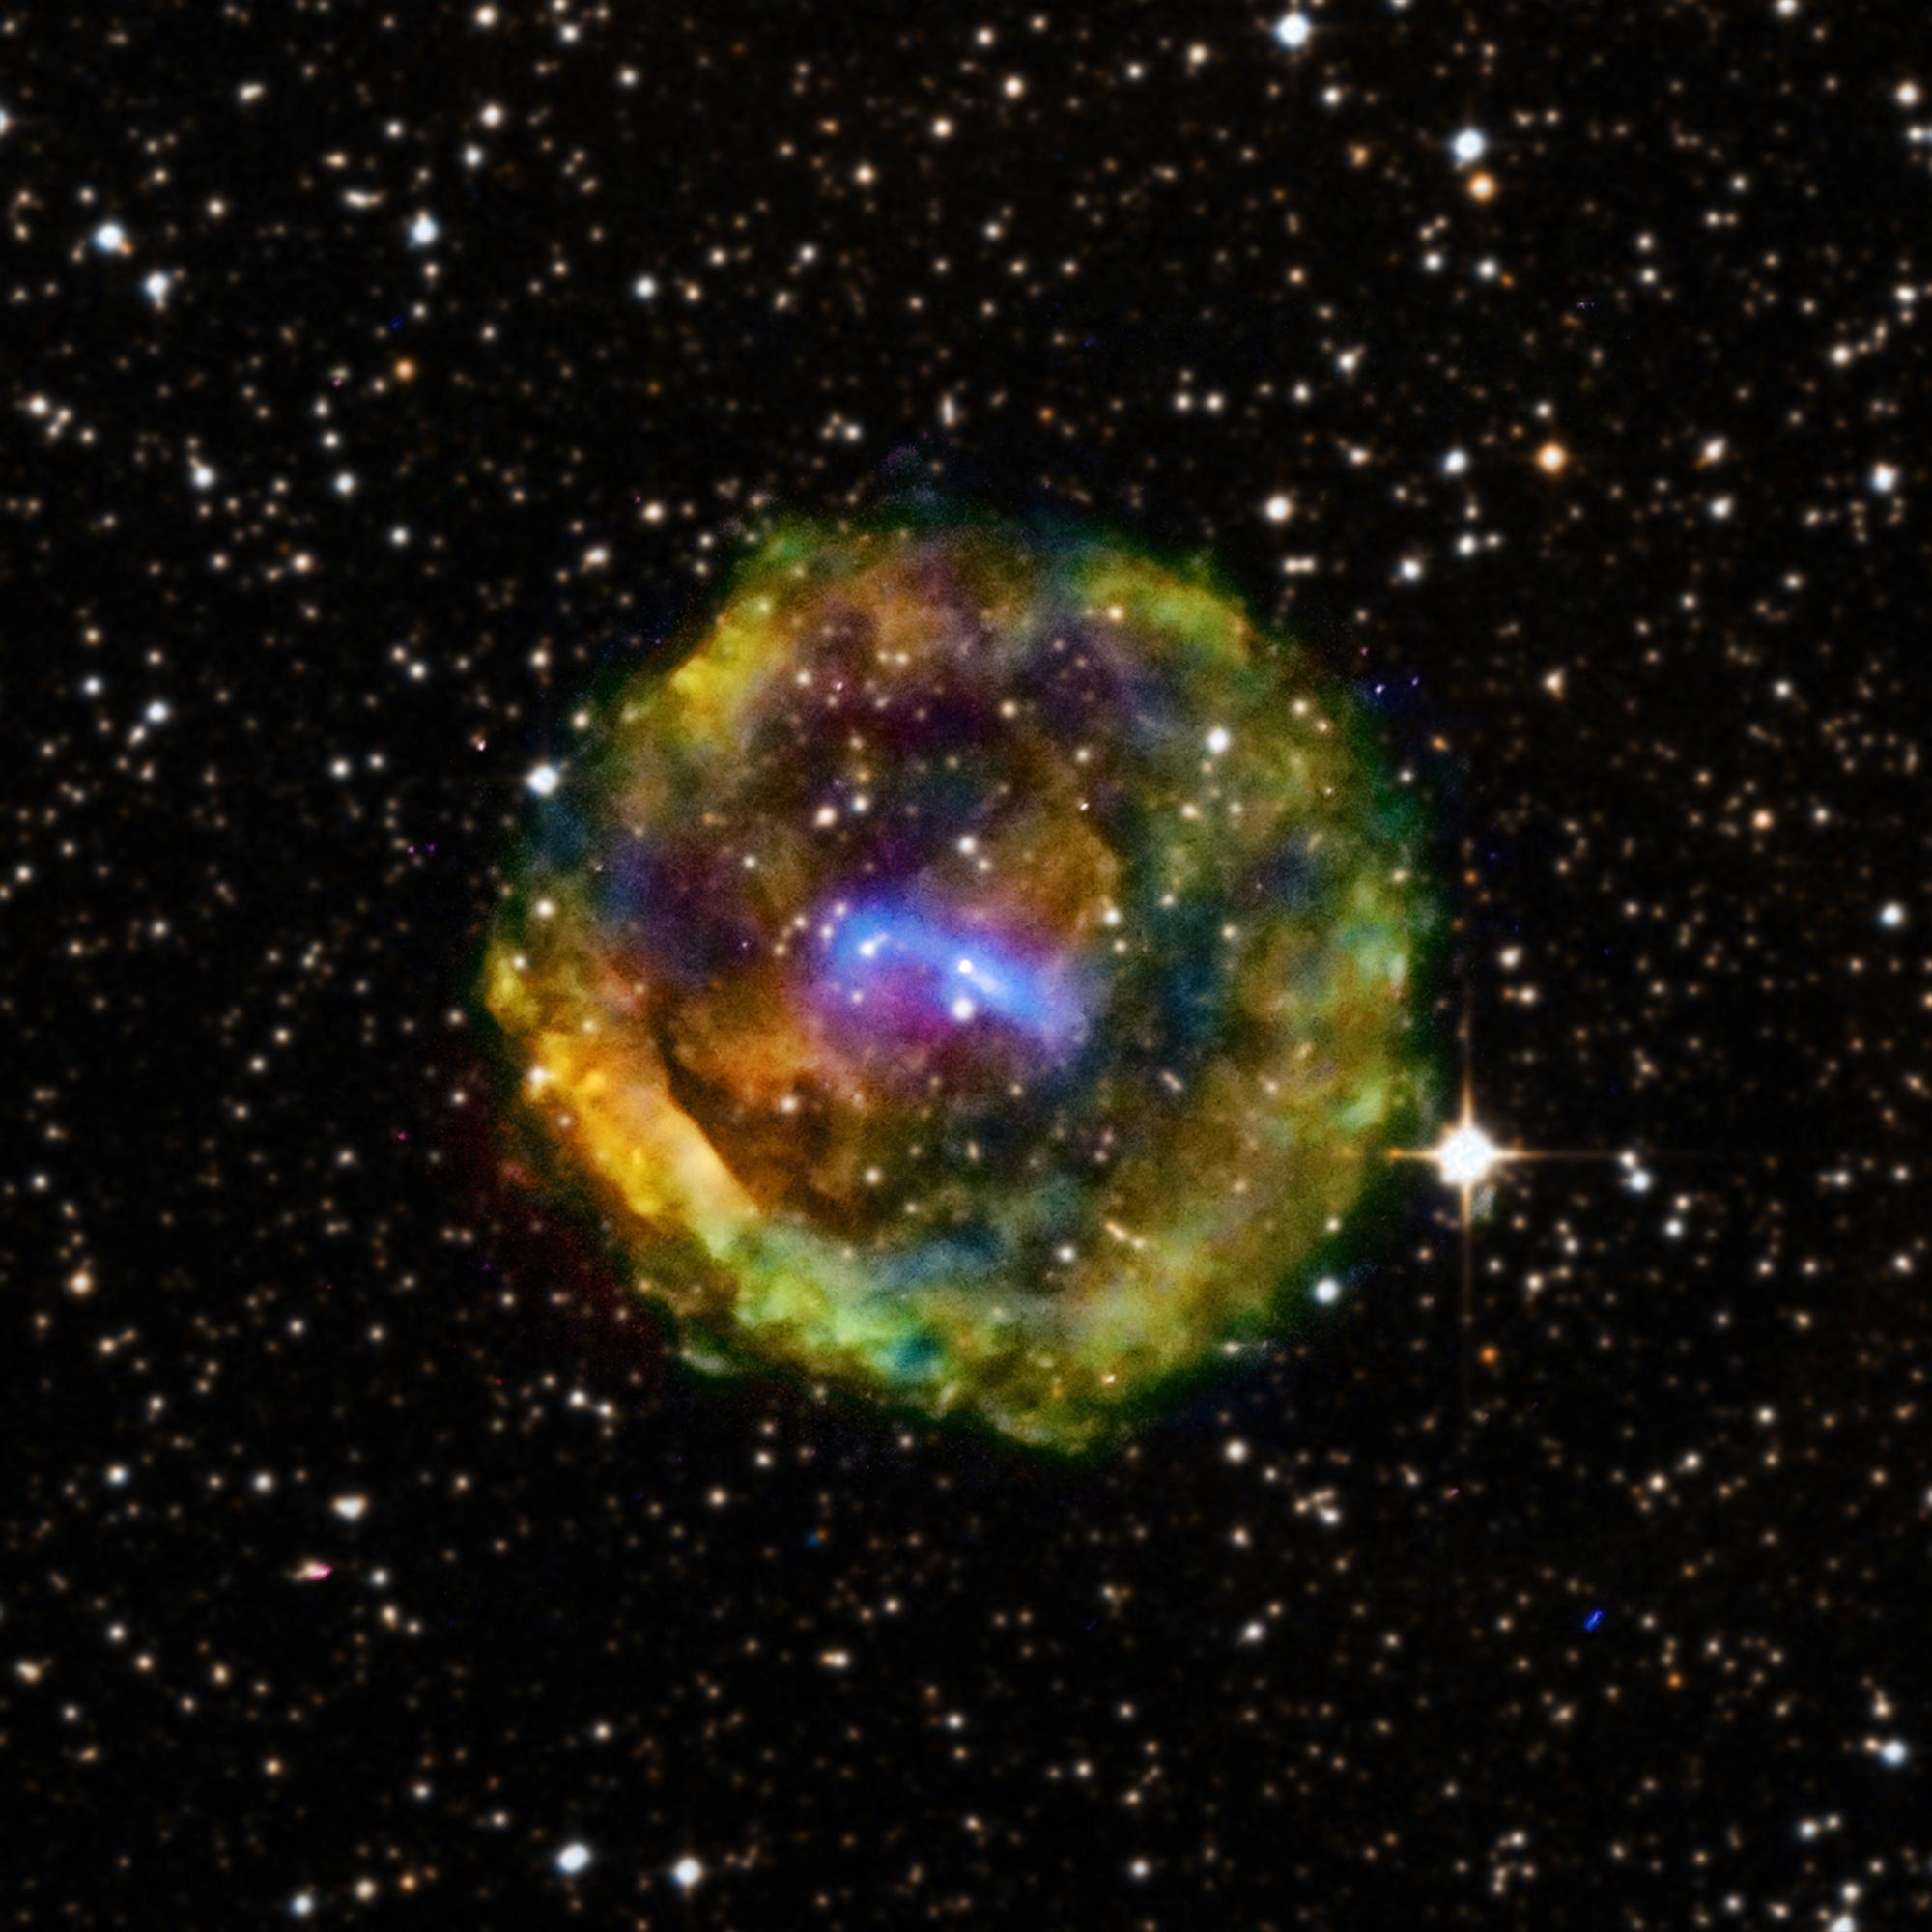 Mistaken Identity: Ancient Supernova Explosion Gets New Backstory